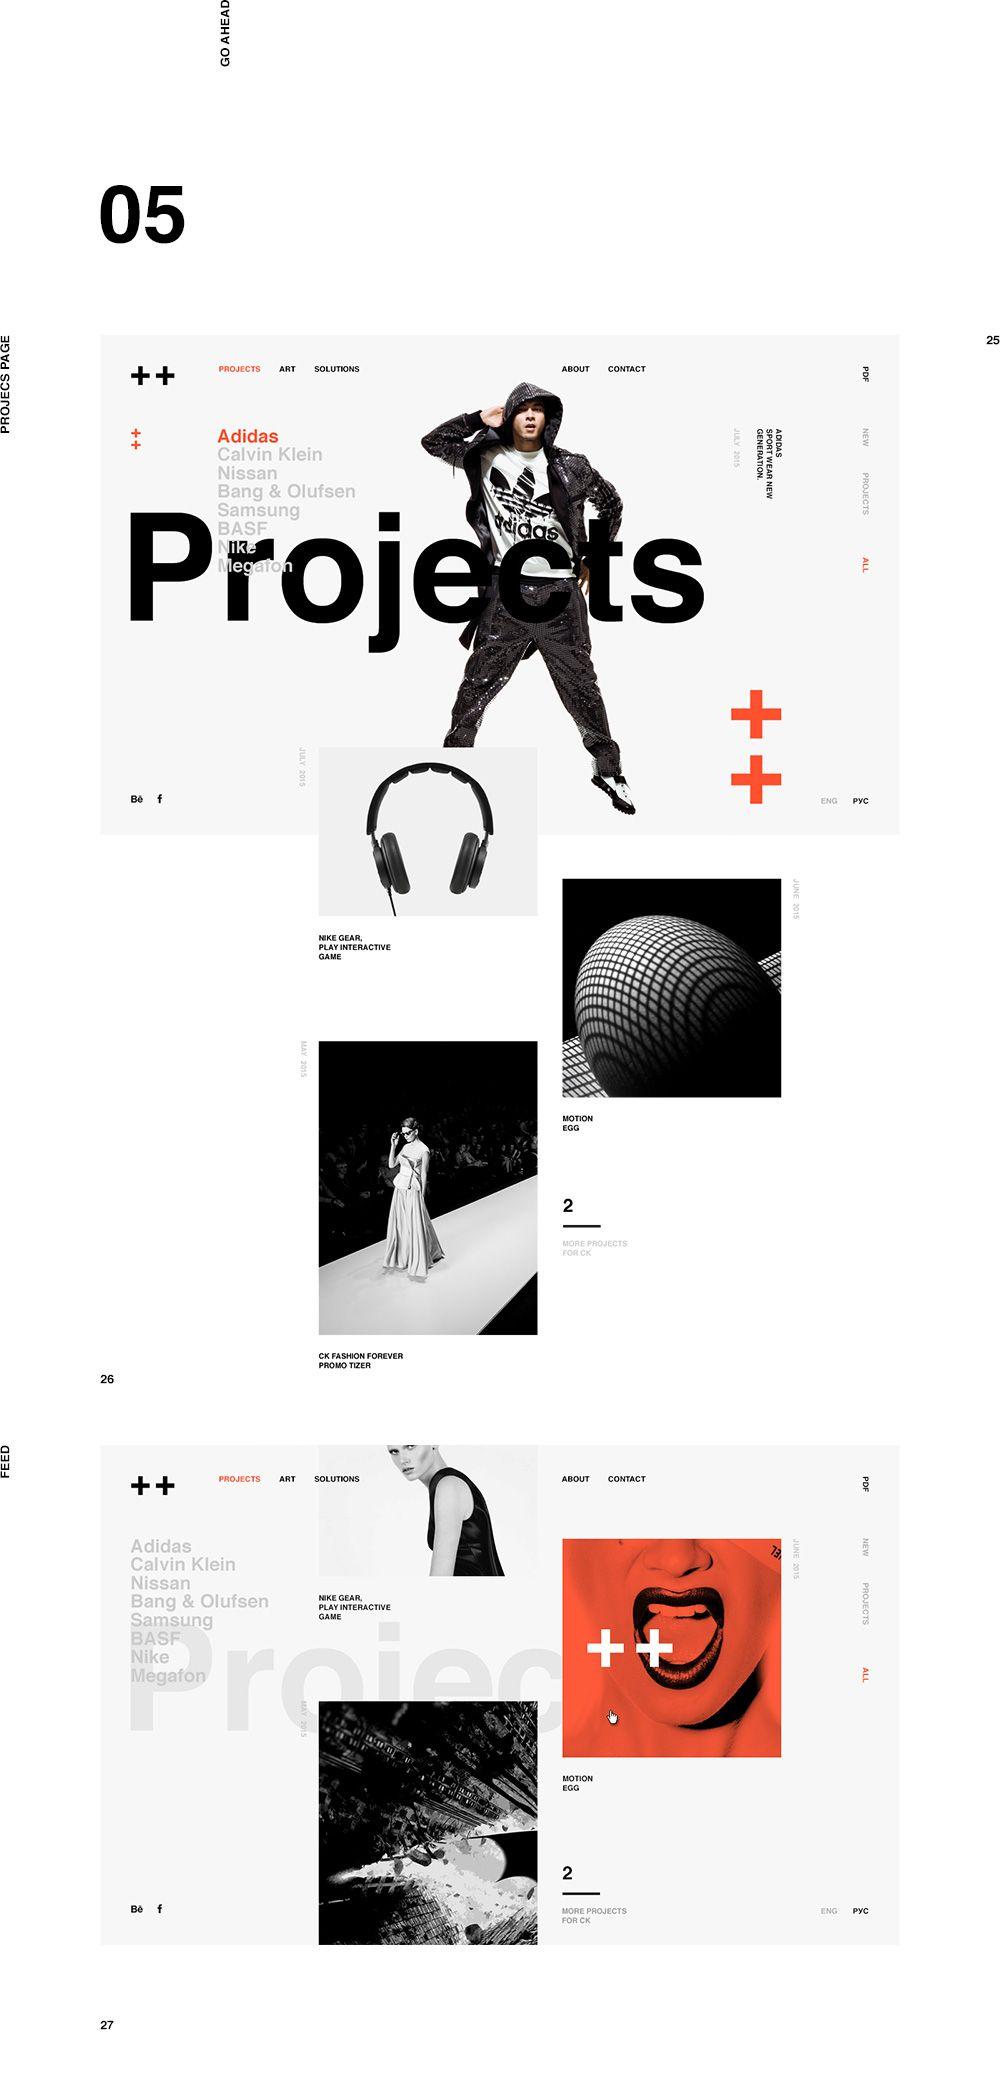 We create unique digital experiences and branding solutions.